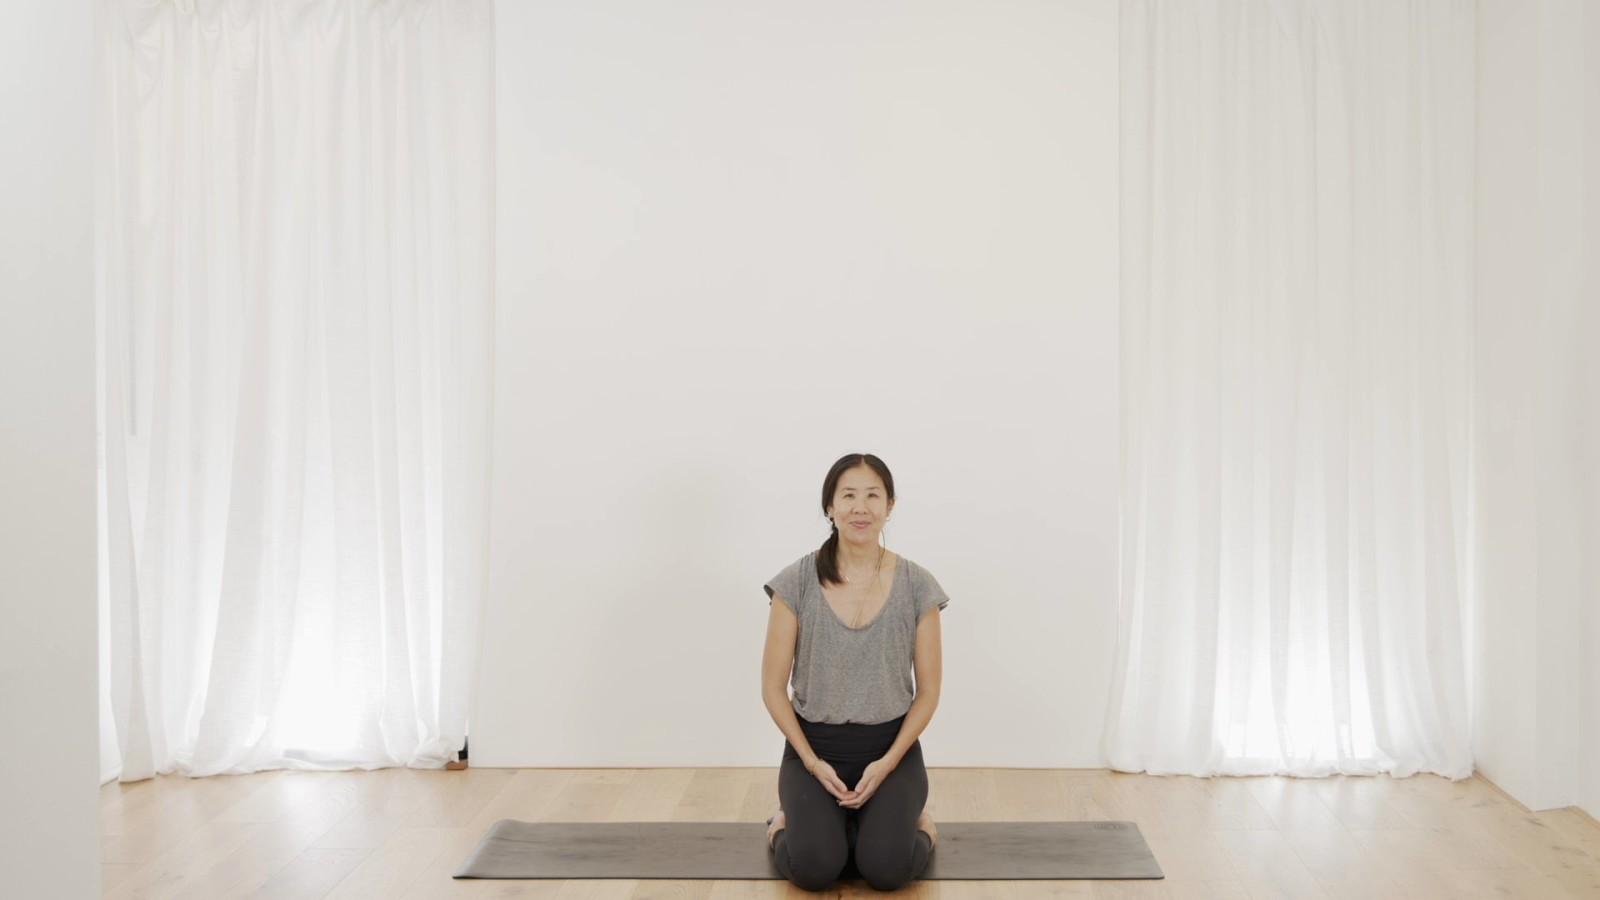 Relax with Yoga Nidra with Leanne Raab